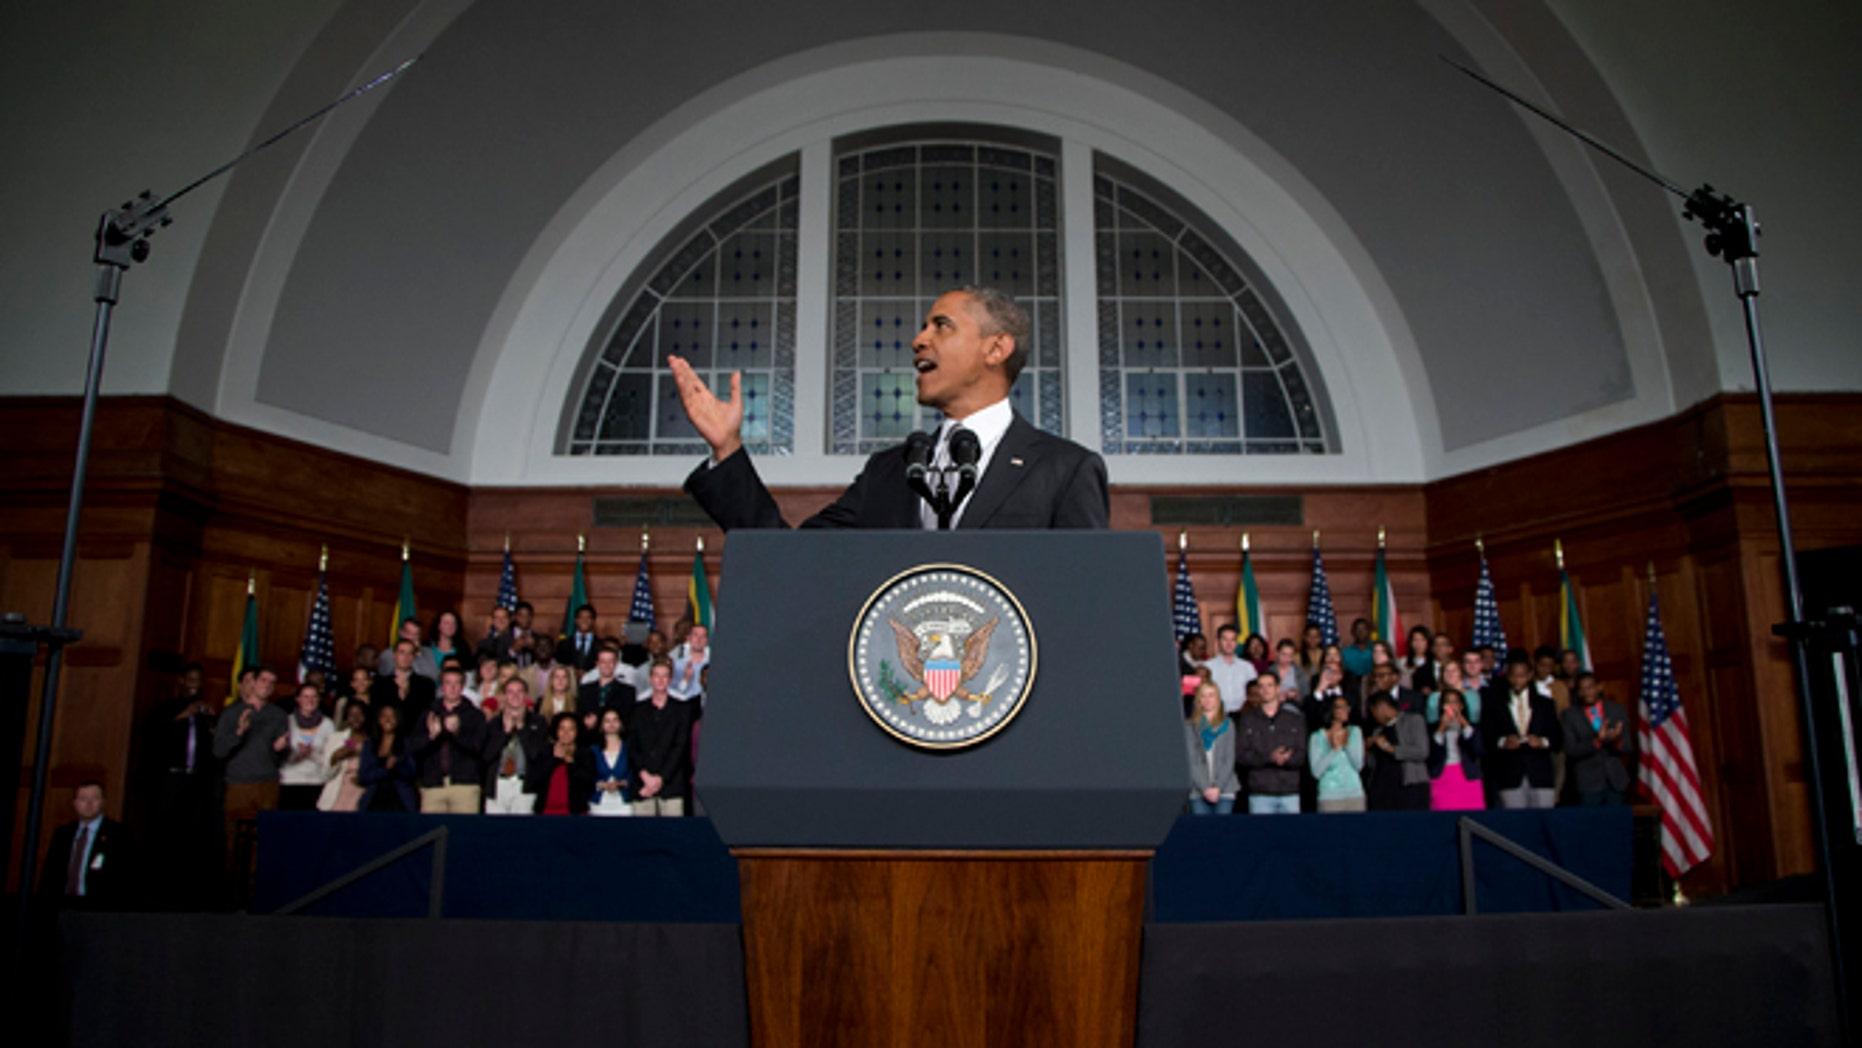 President Obama Announces 30 Billion >> Obama Announces New 7 Billion Power Initiative For Africa Fox News